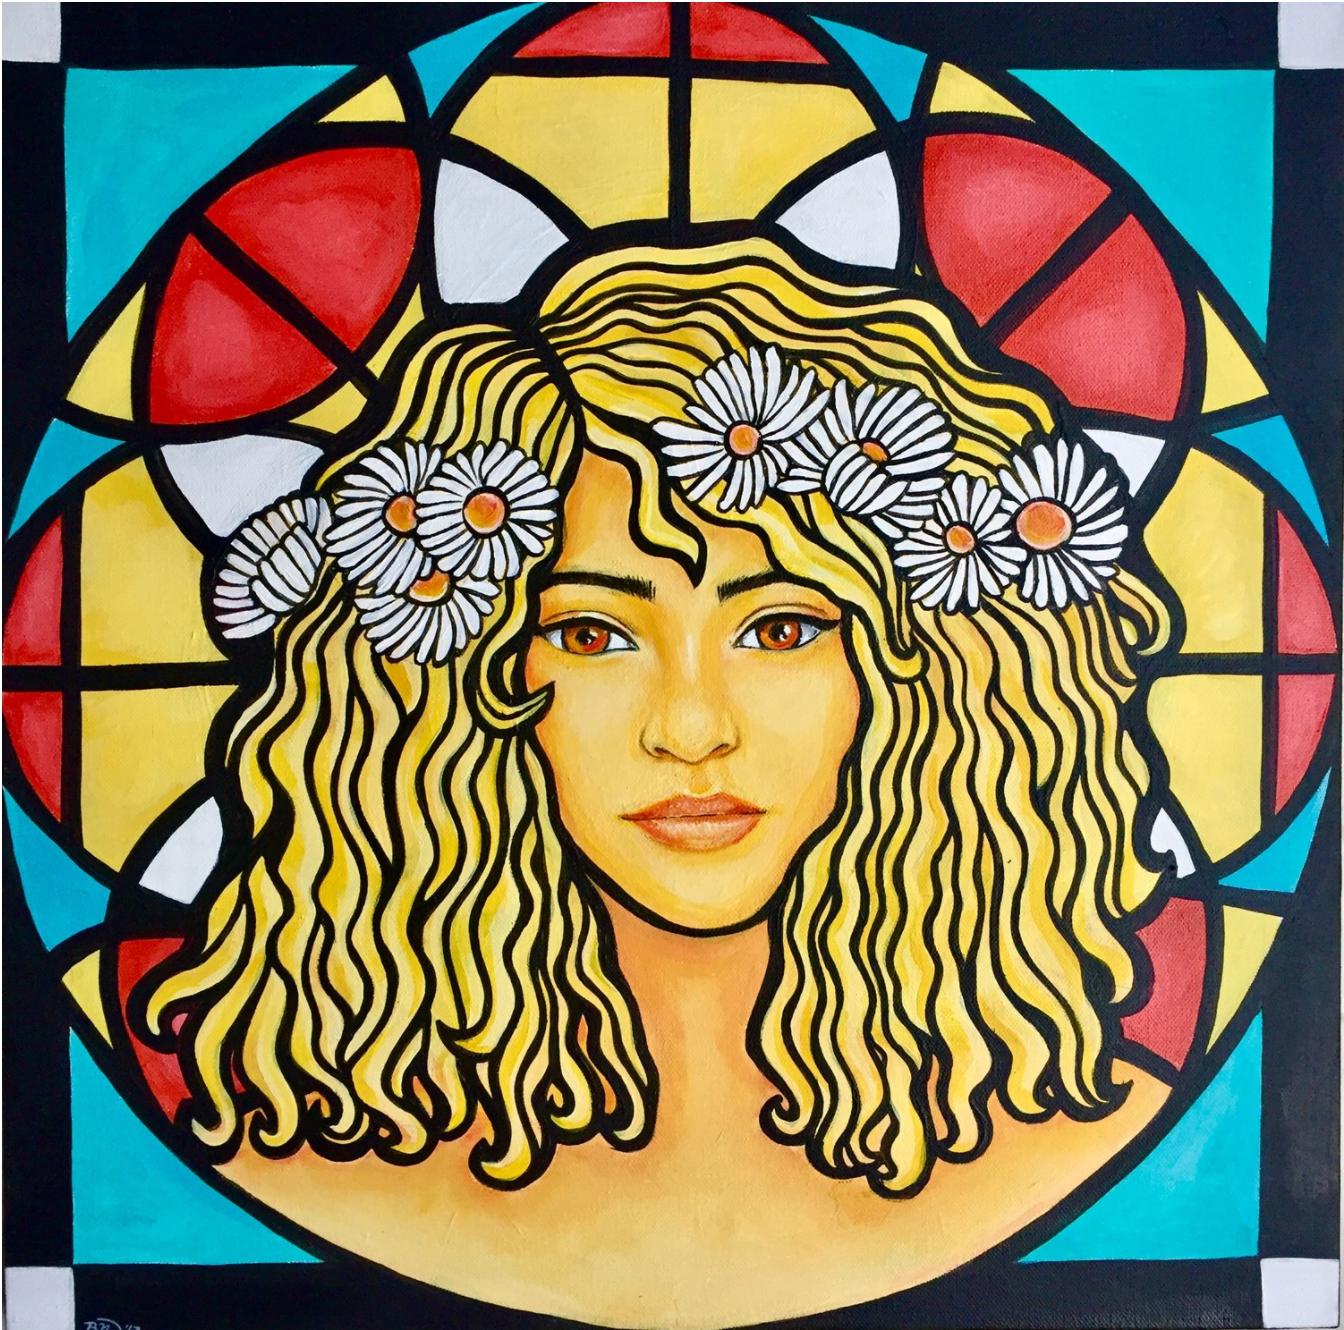 Morning Light   2017. Acrylic on canvas. 20 x 20.  $400 -  SOLD